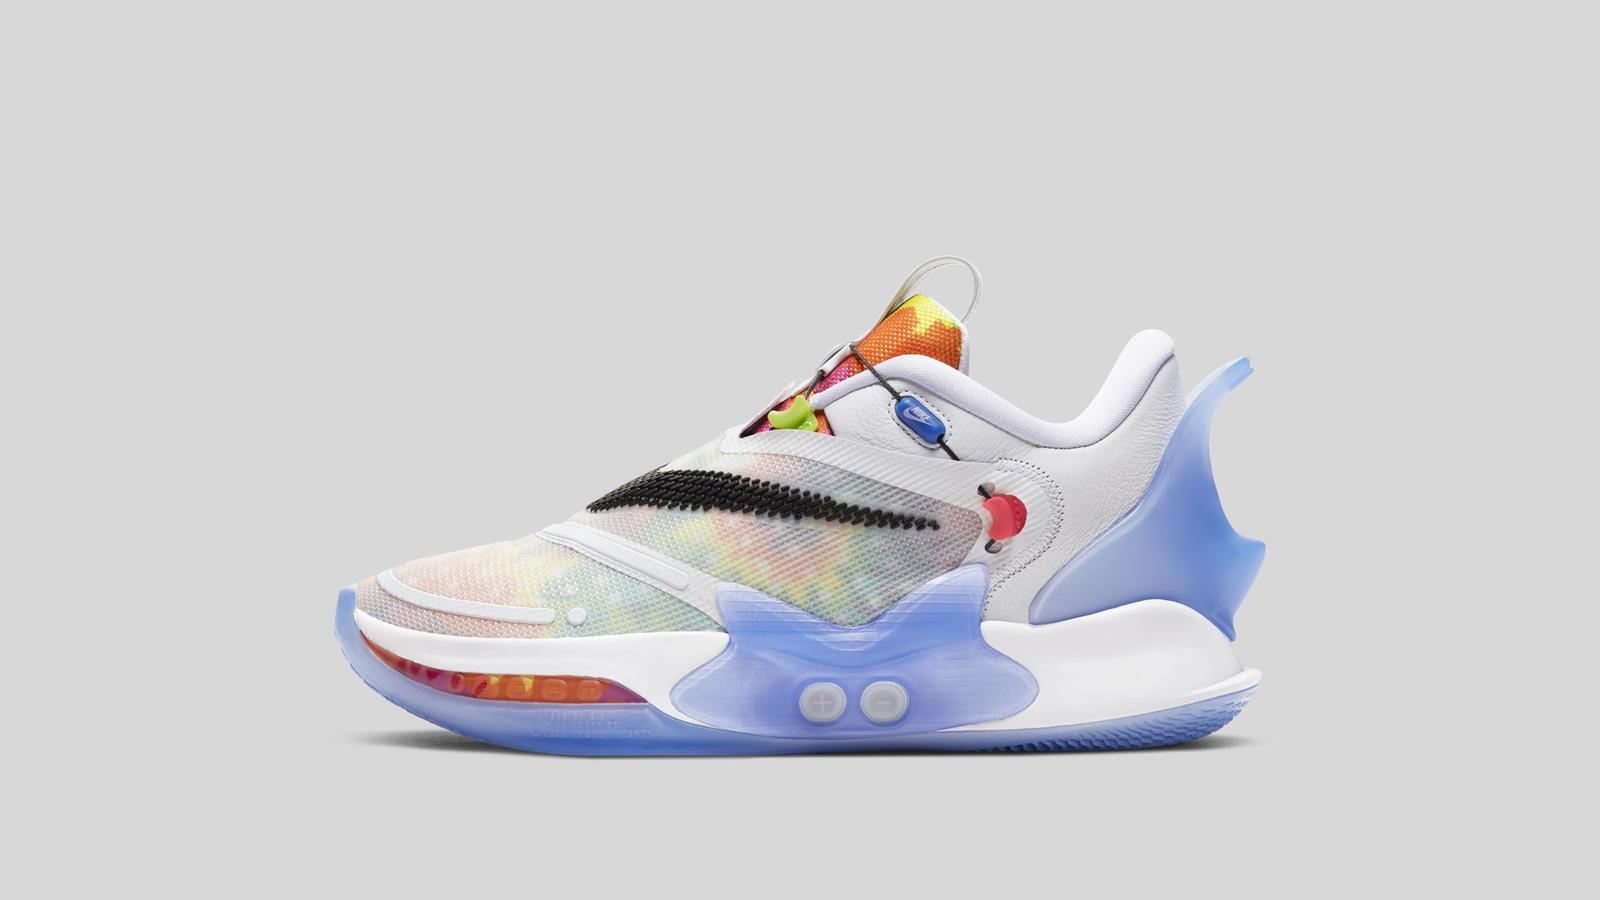 Nike Adapt BB 2.0 Tie Dye 0